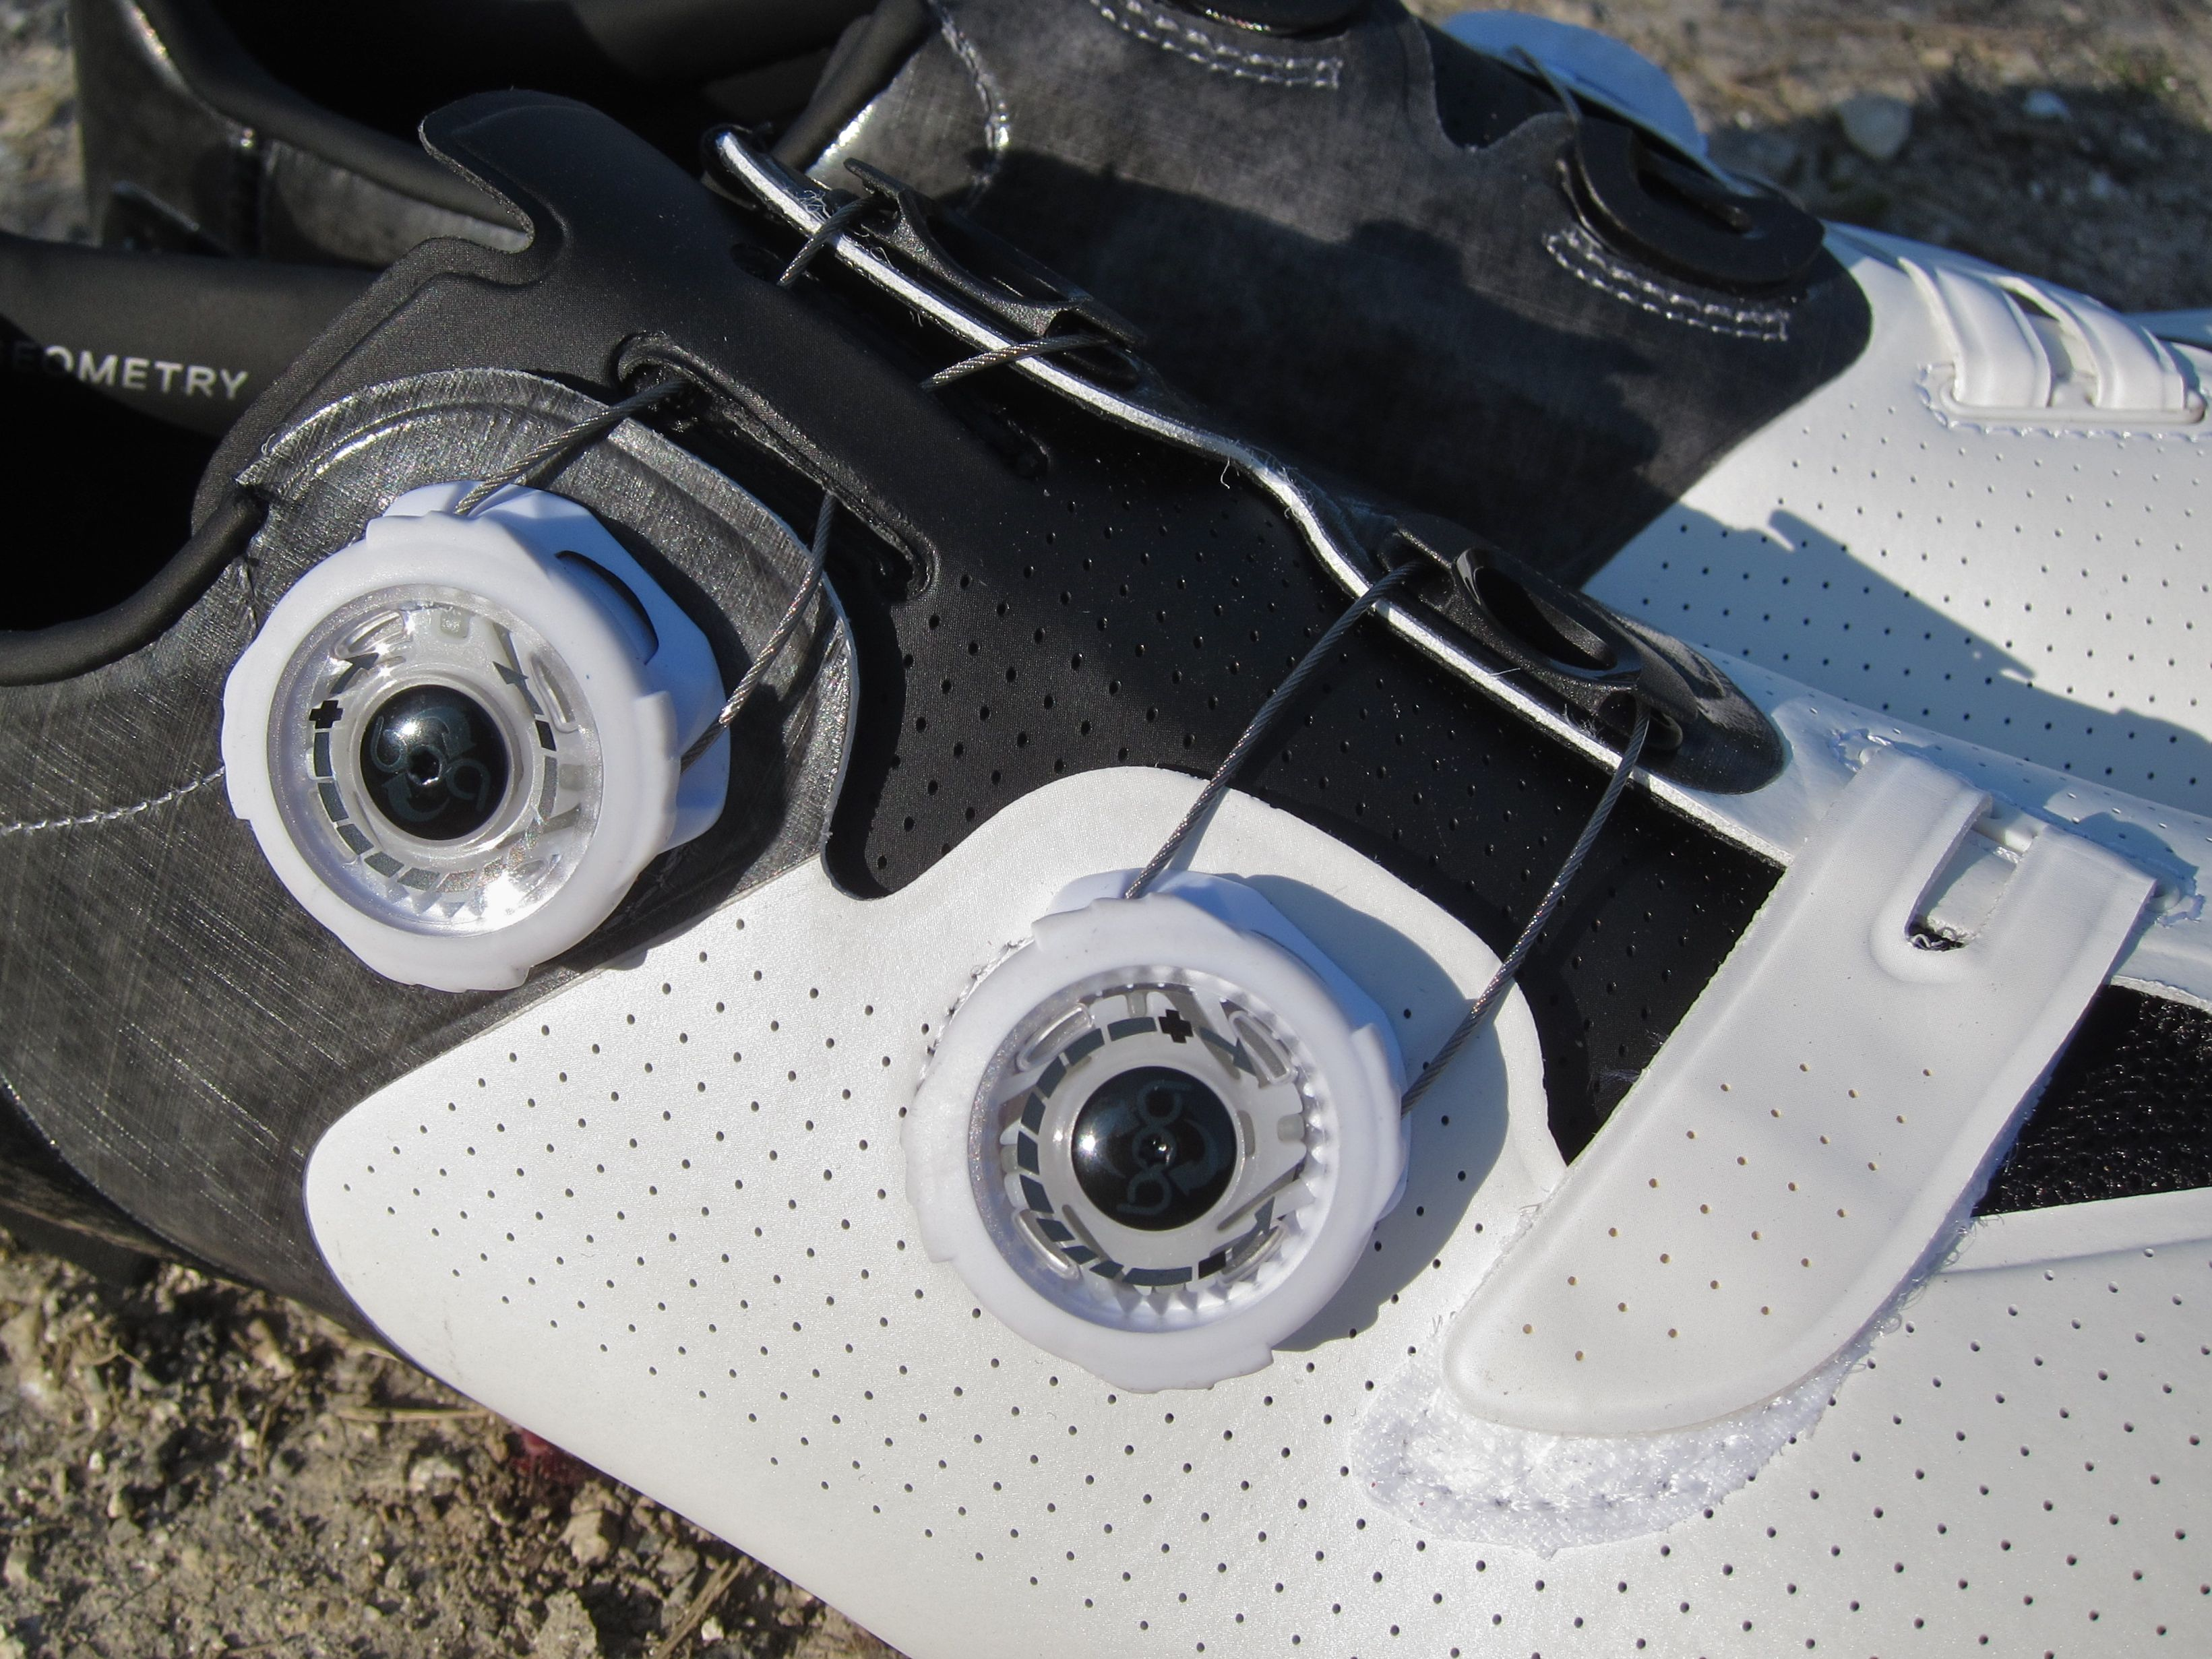 Specialized S-Works 6 XC MTB Shoe - BOA Dials Strap.jpg